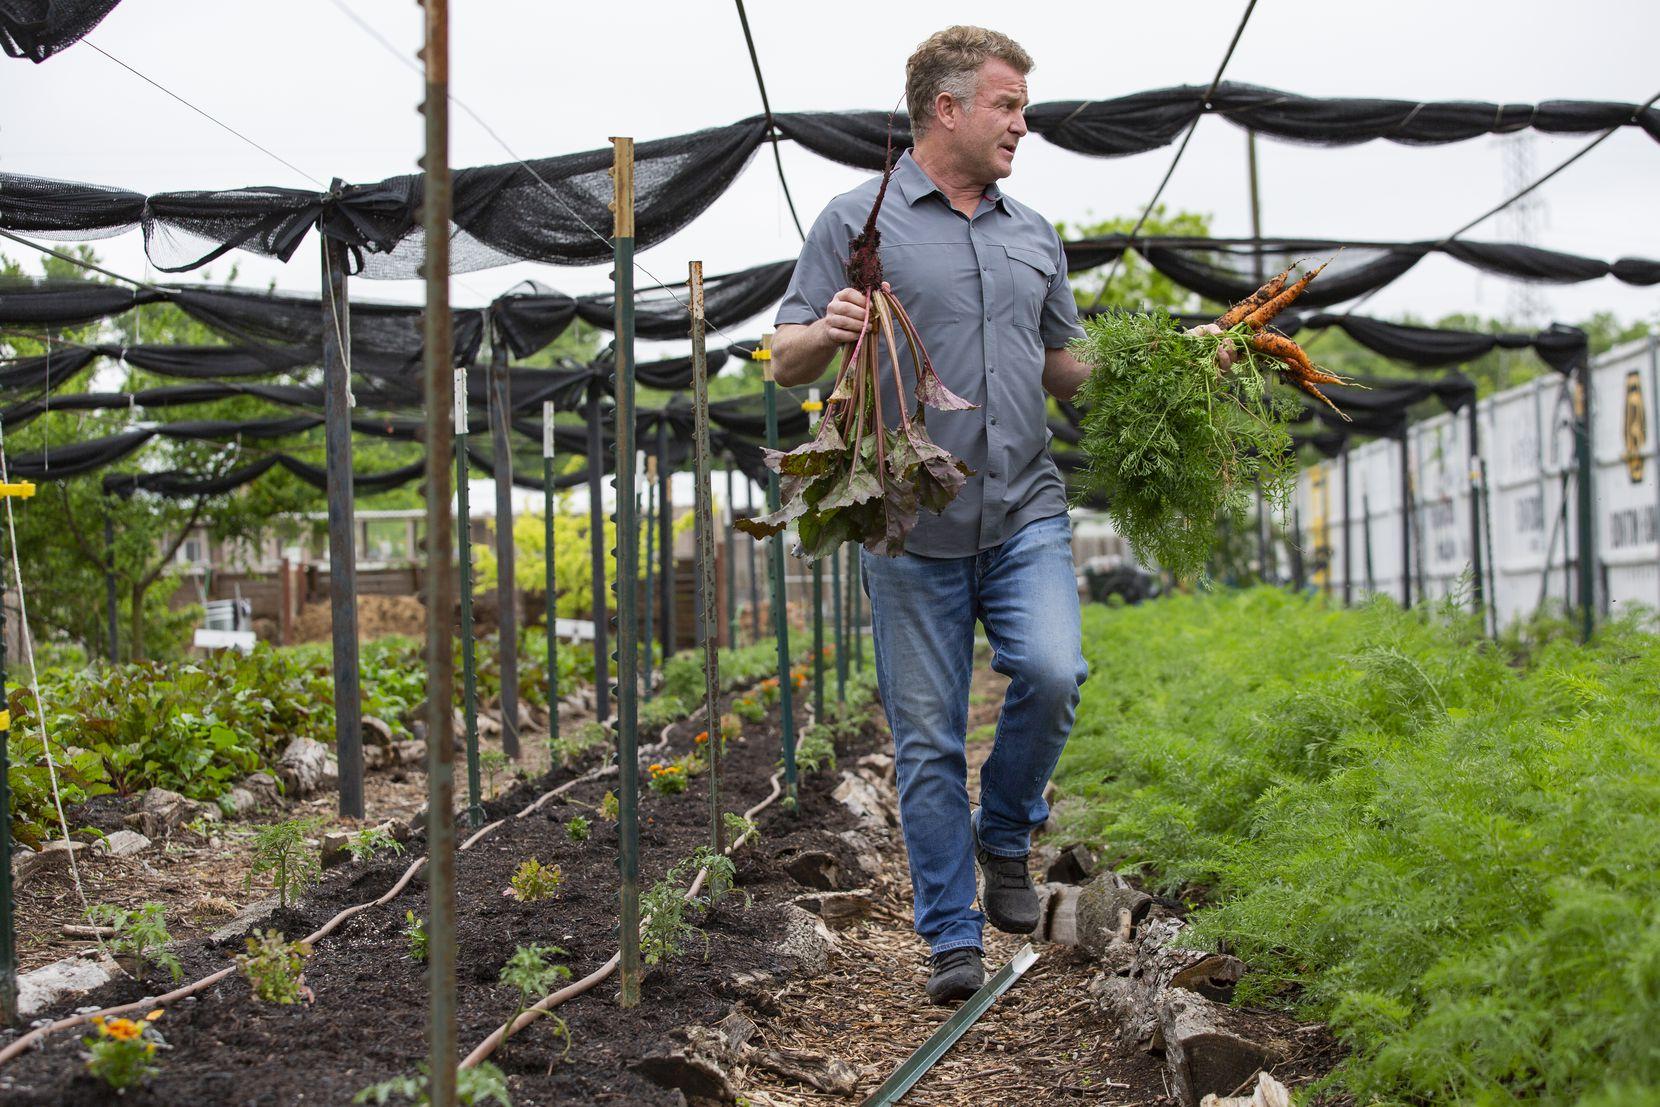 Daron Babcock, executive director of Bonton Farms, harvests carrots from the South Dallas farm.